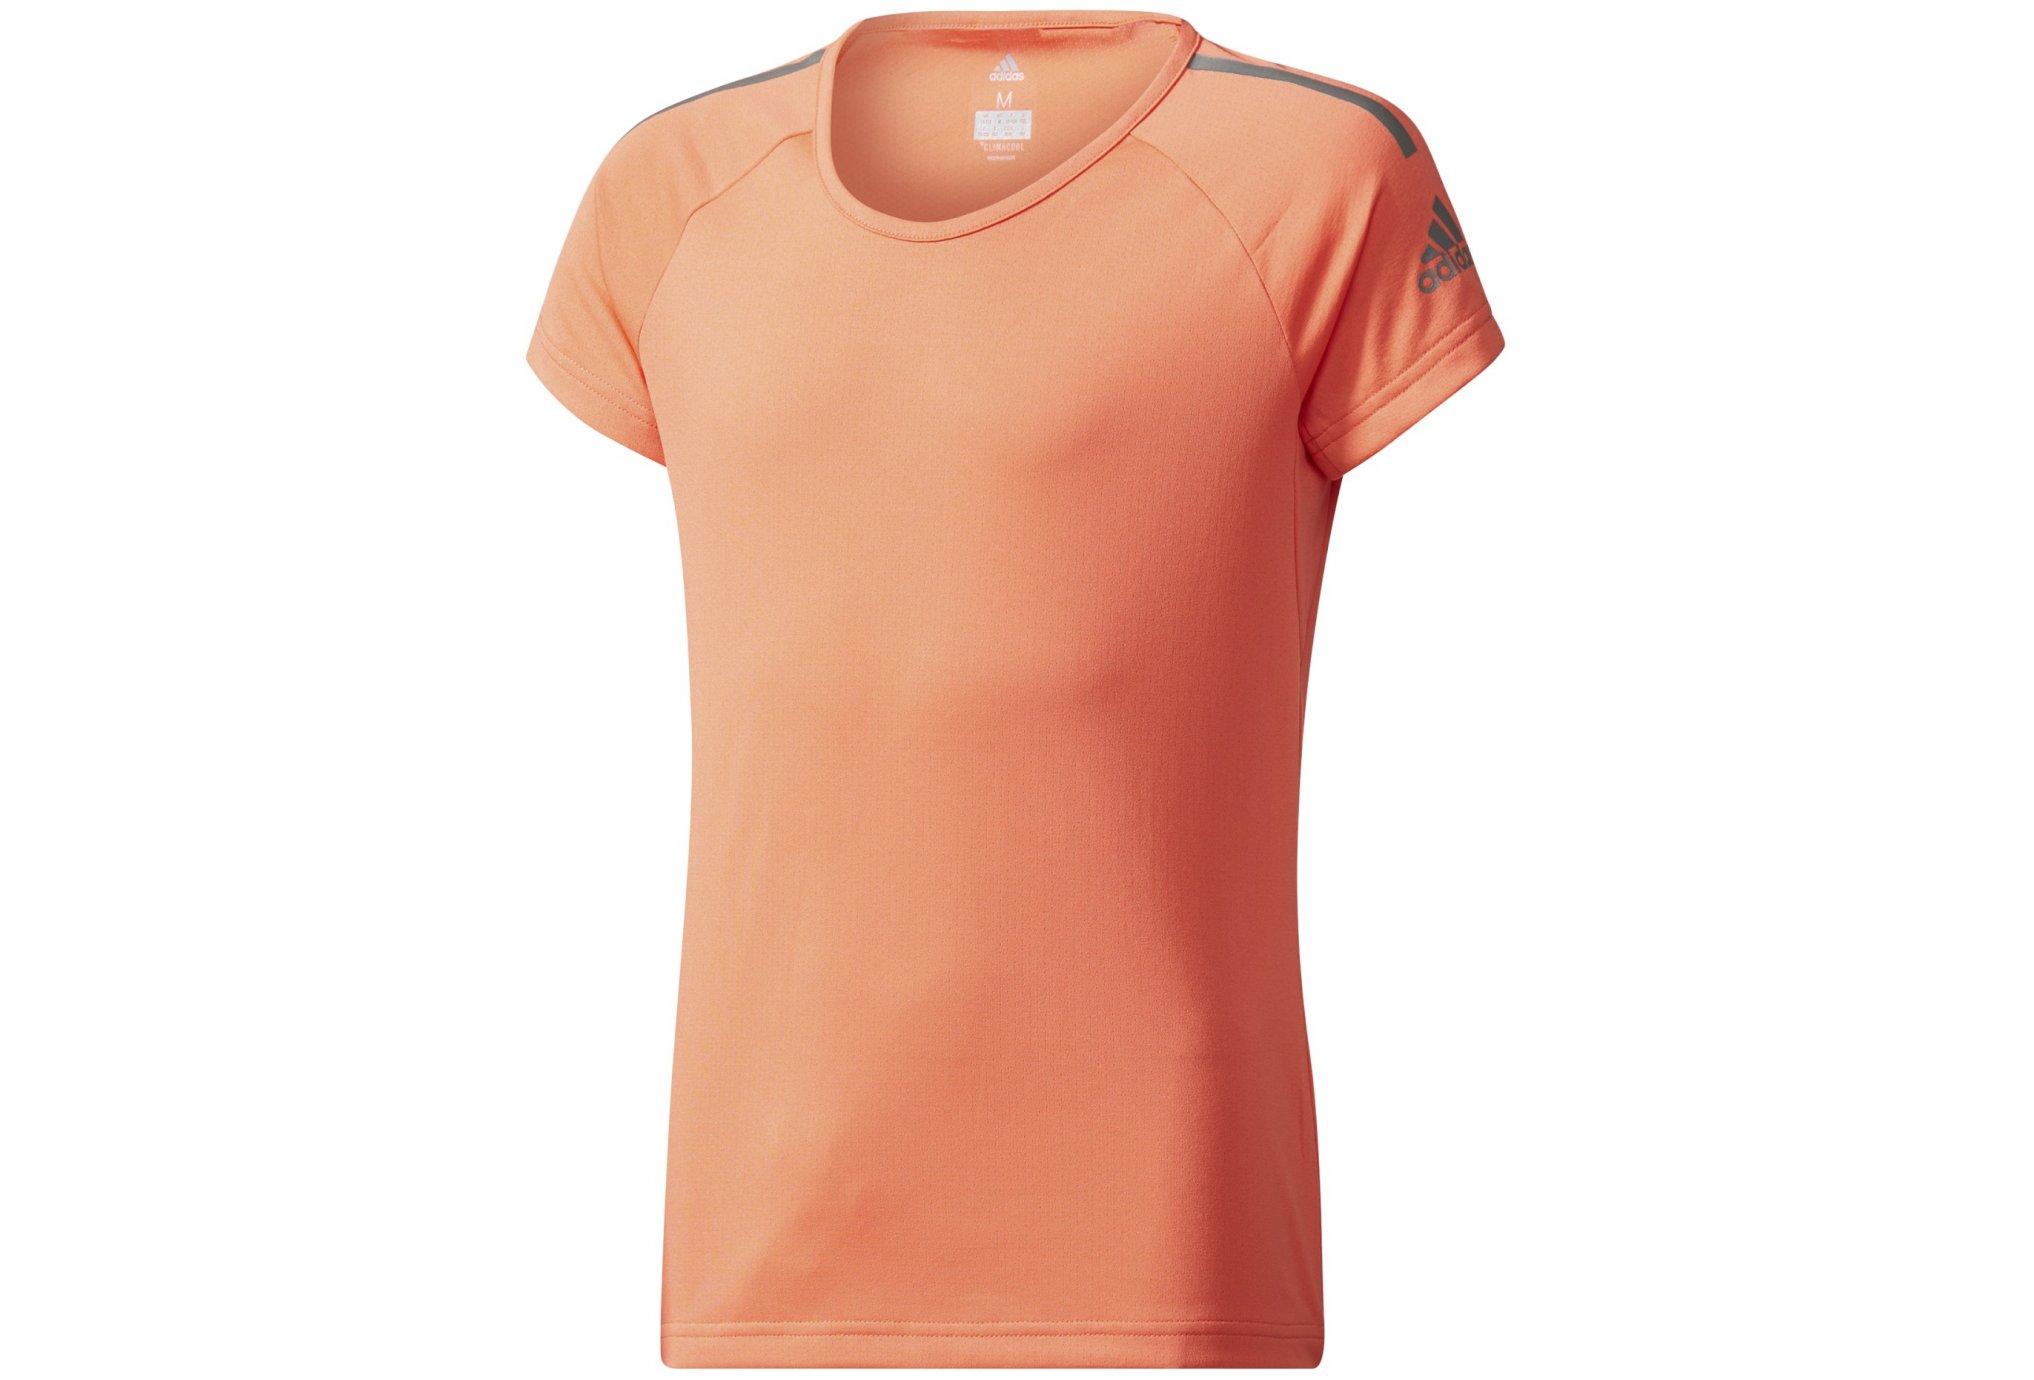 outlet store 8dd7c f07a3 adidas Climaccol Fille vêtement running femme